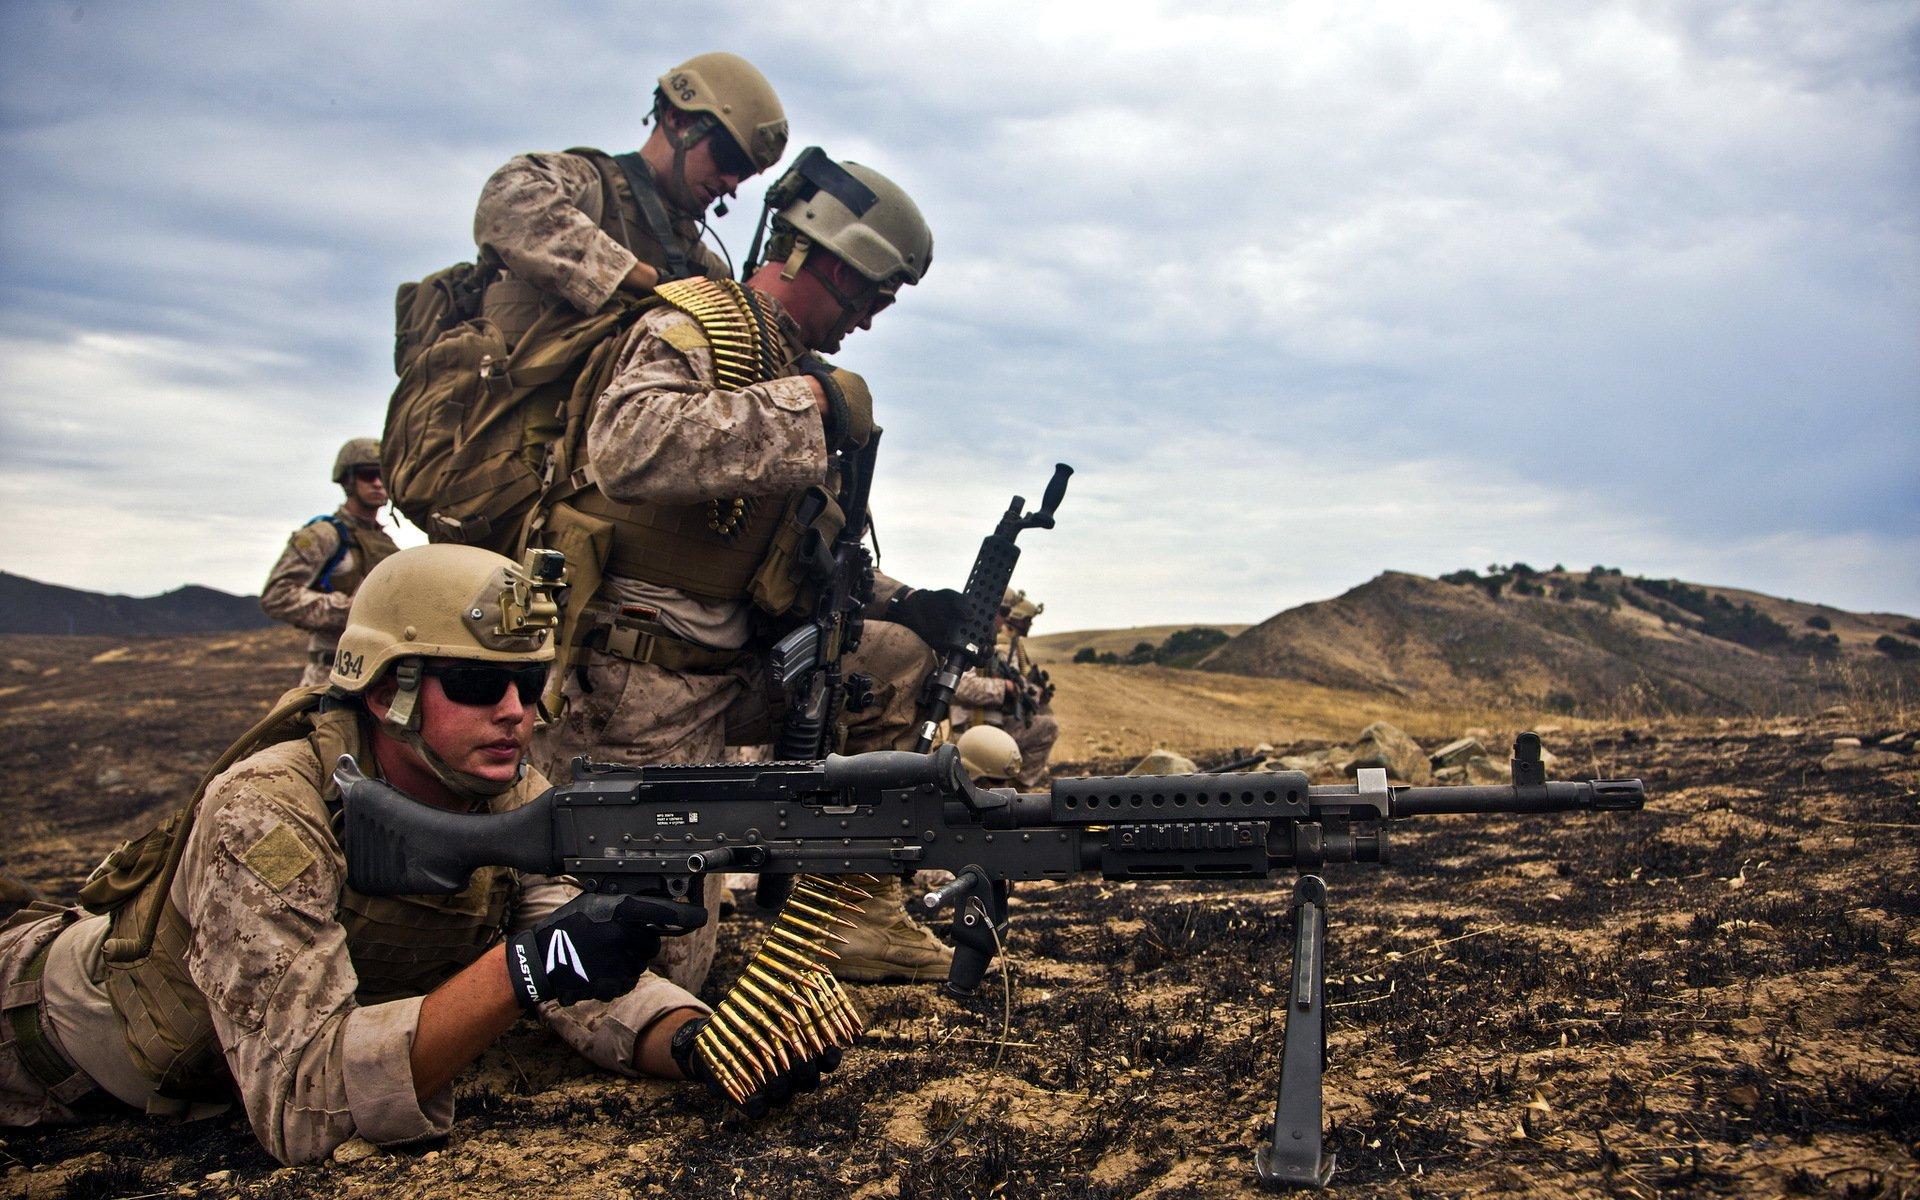 картинки солдат америки способ